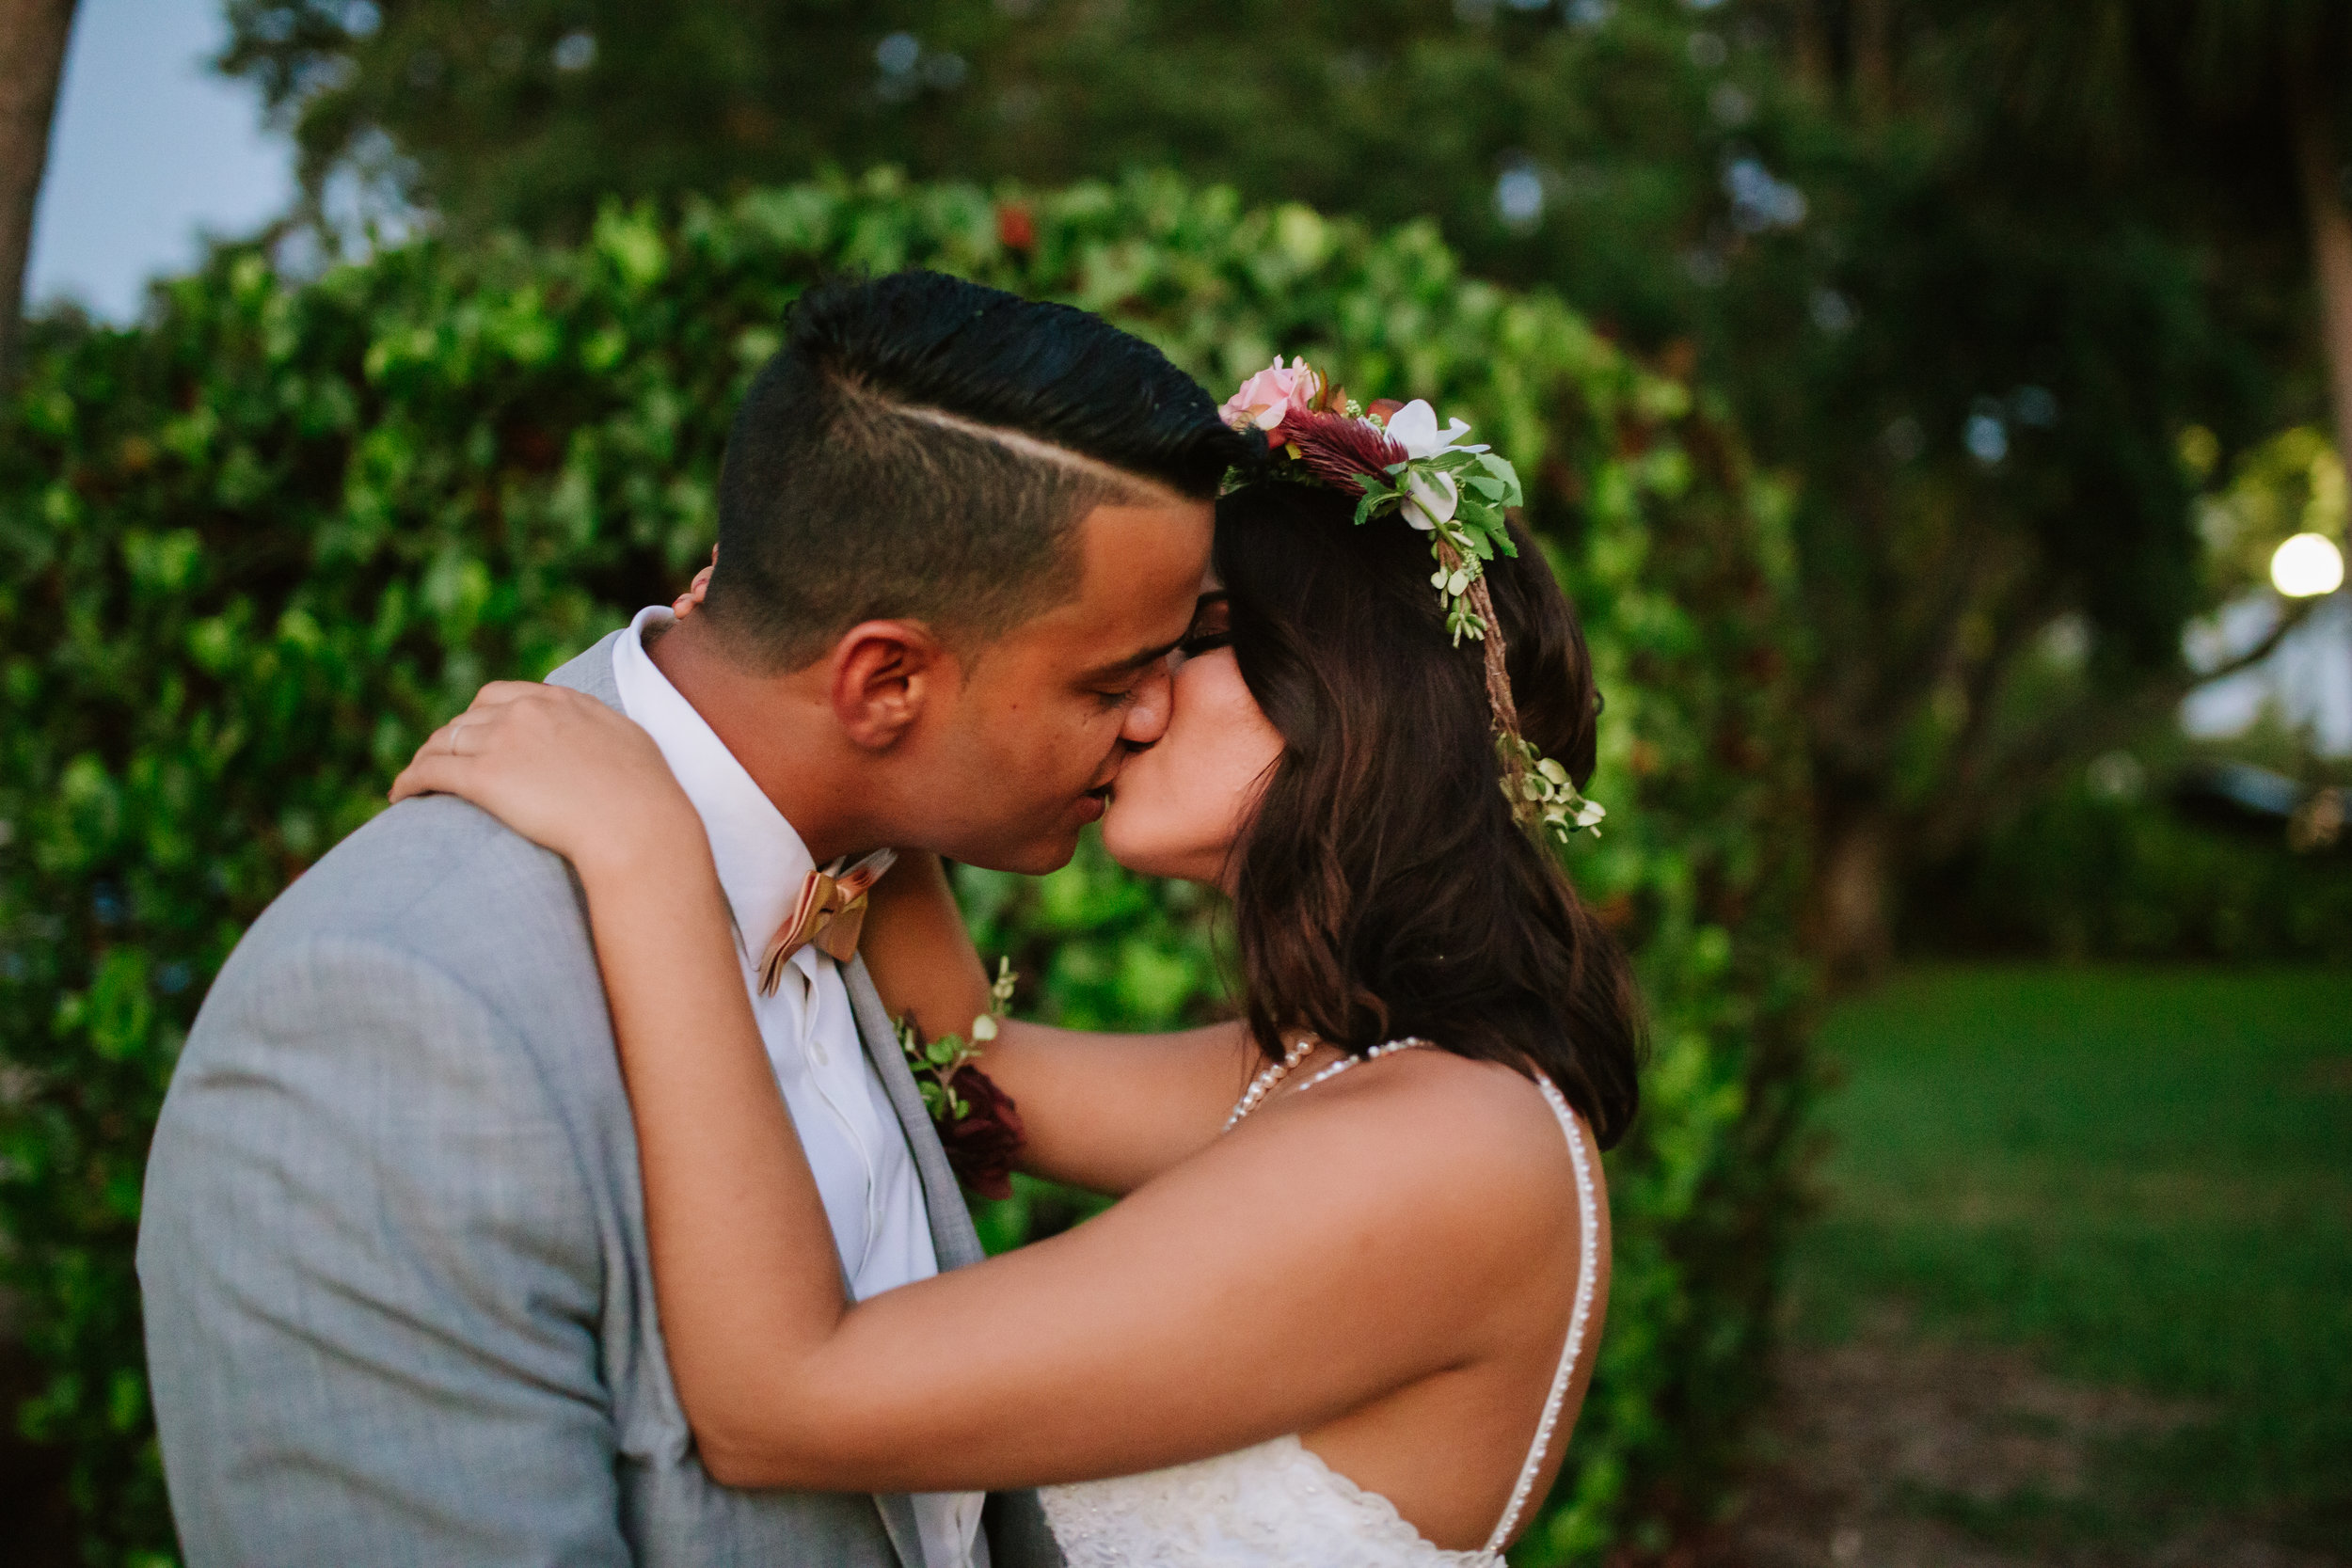 2017.05.23 Barbara and Mauricio Sales Port St Lucie Wedding (506 of 772).jpg